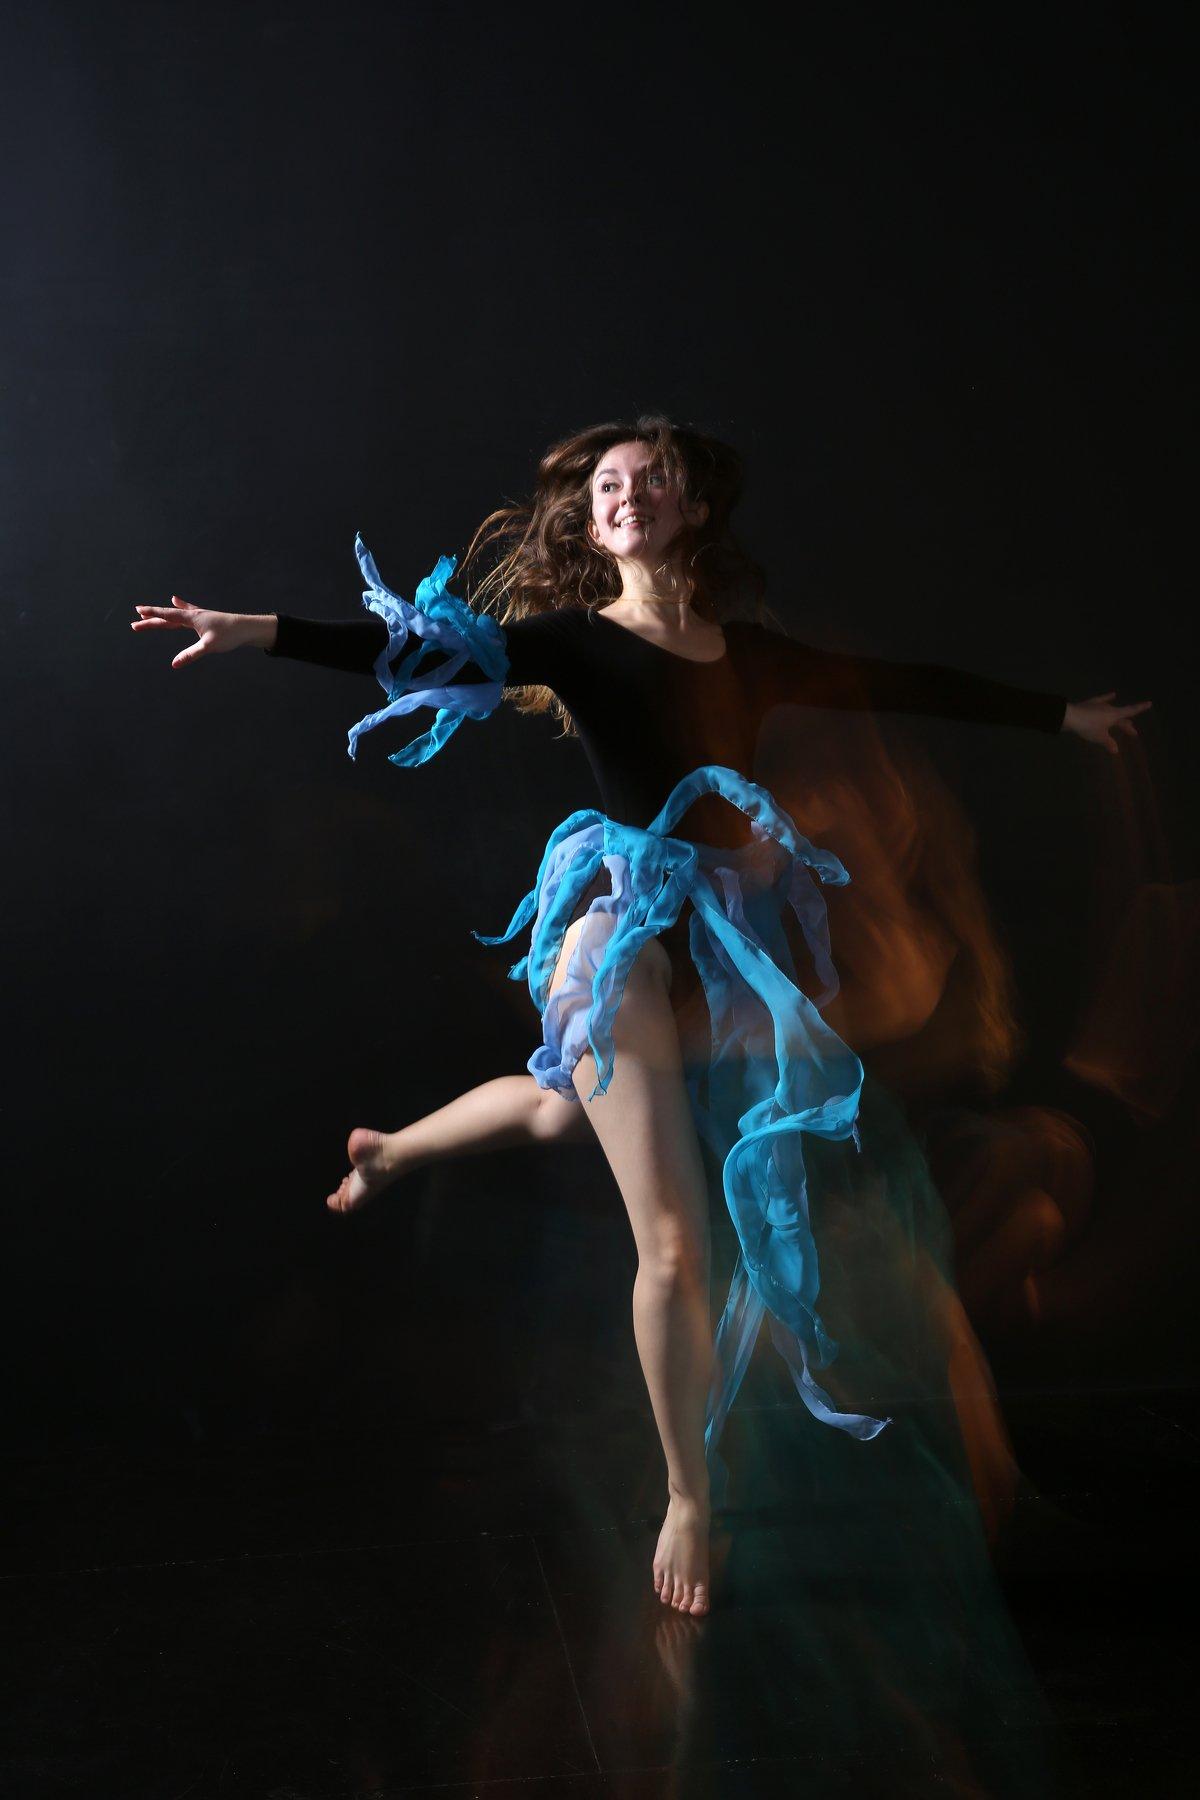 танец, движение, девушка,олег_грачёв dance, girl, oleg_grachev, canon, canonlens, Грачёв Олег